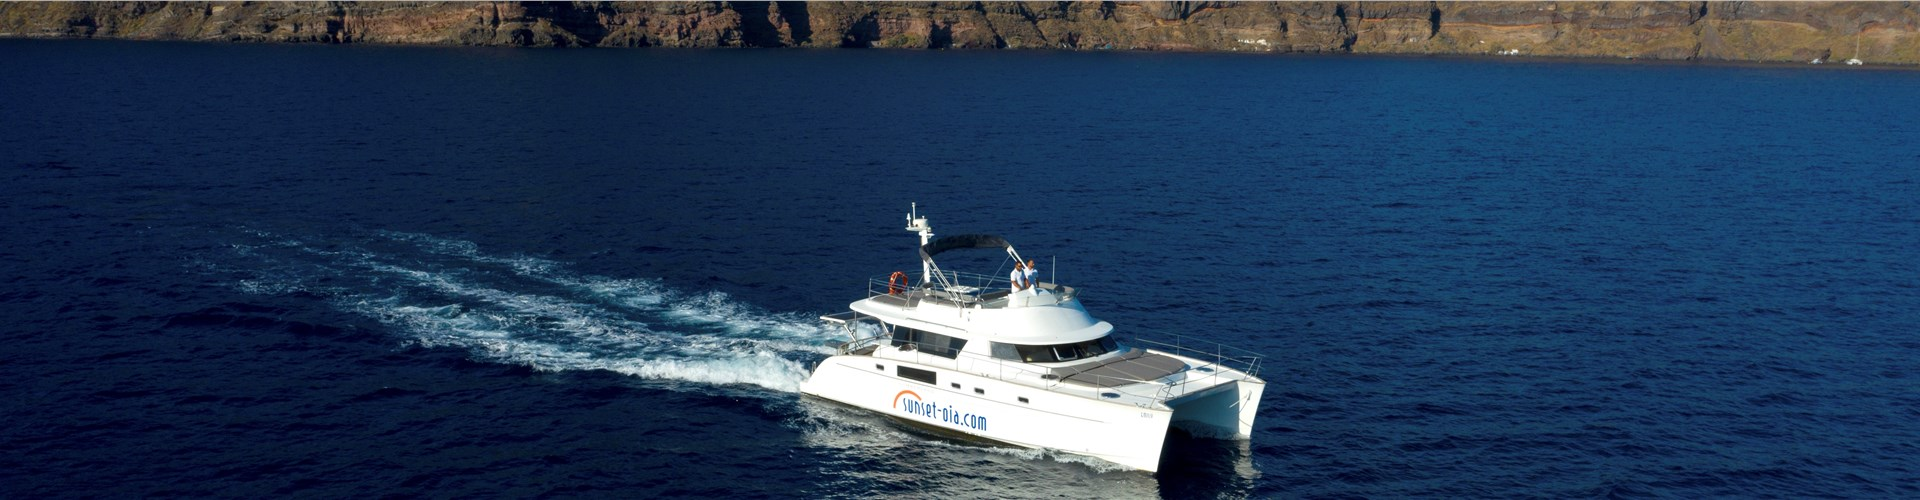 Photo of Power Catamaran Fountaine Pajot Clumberland 46 Emily